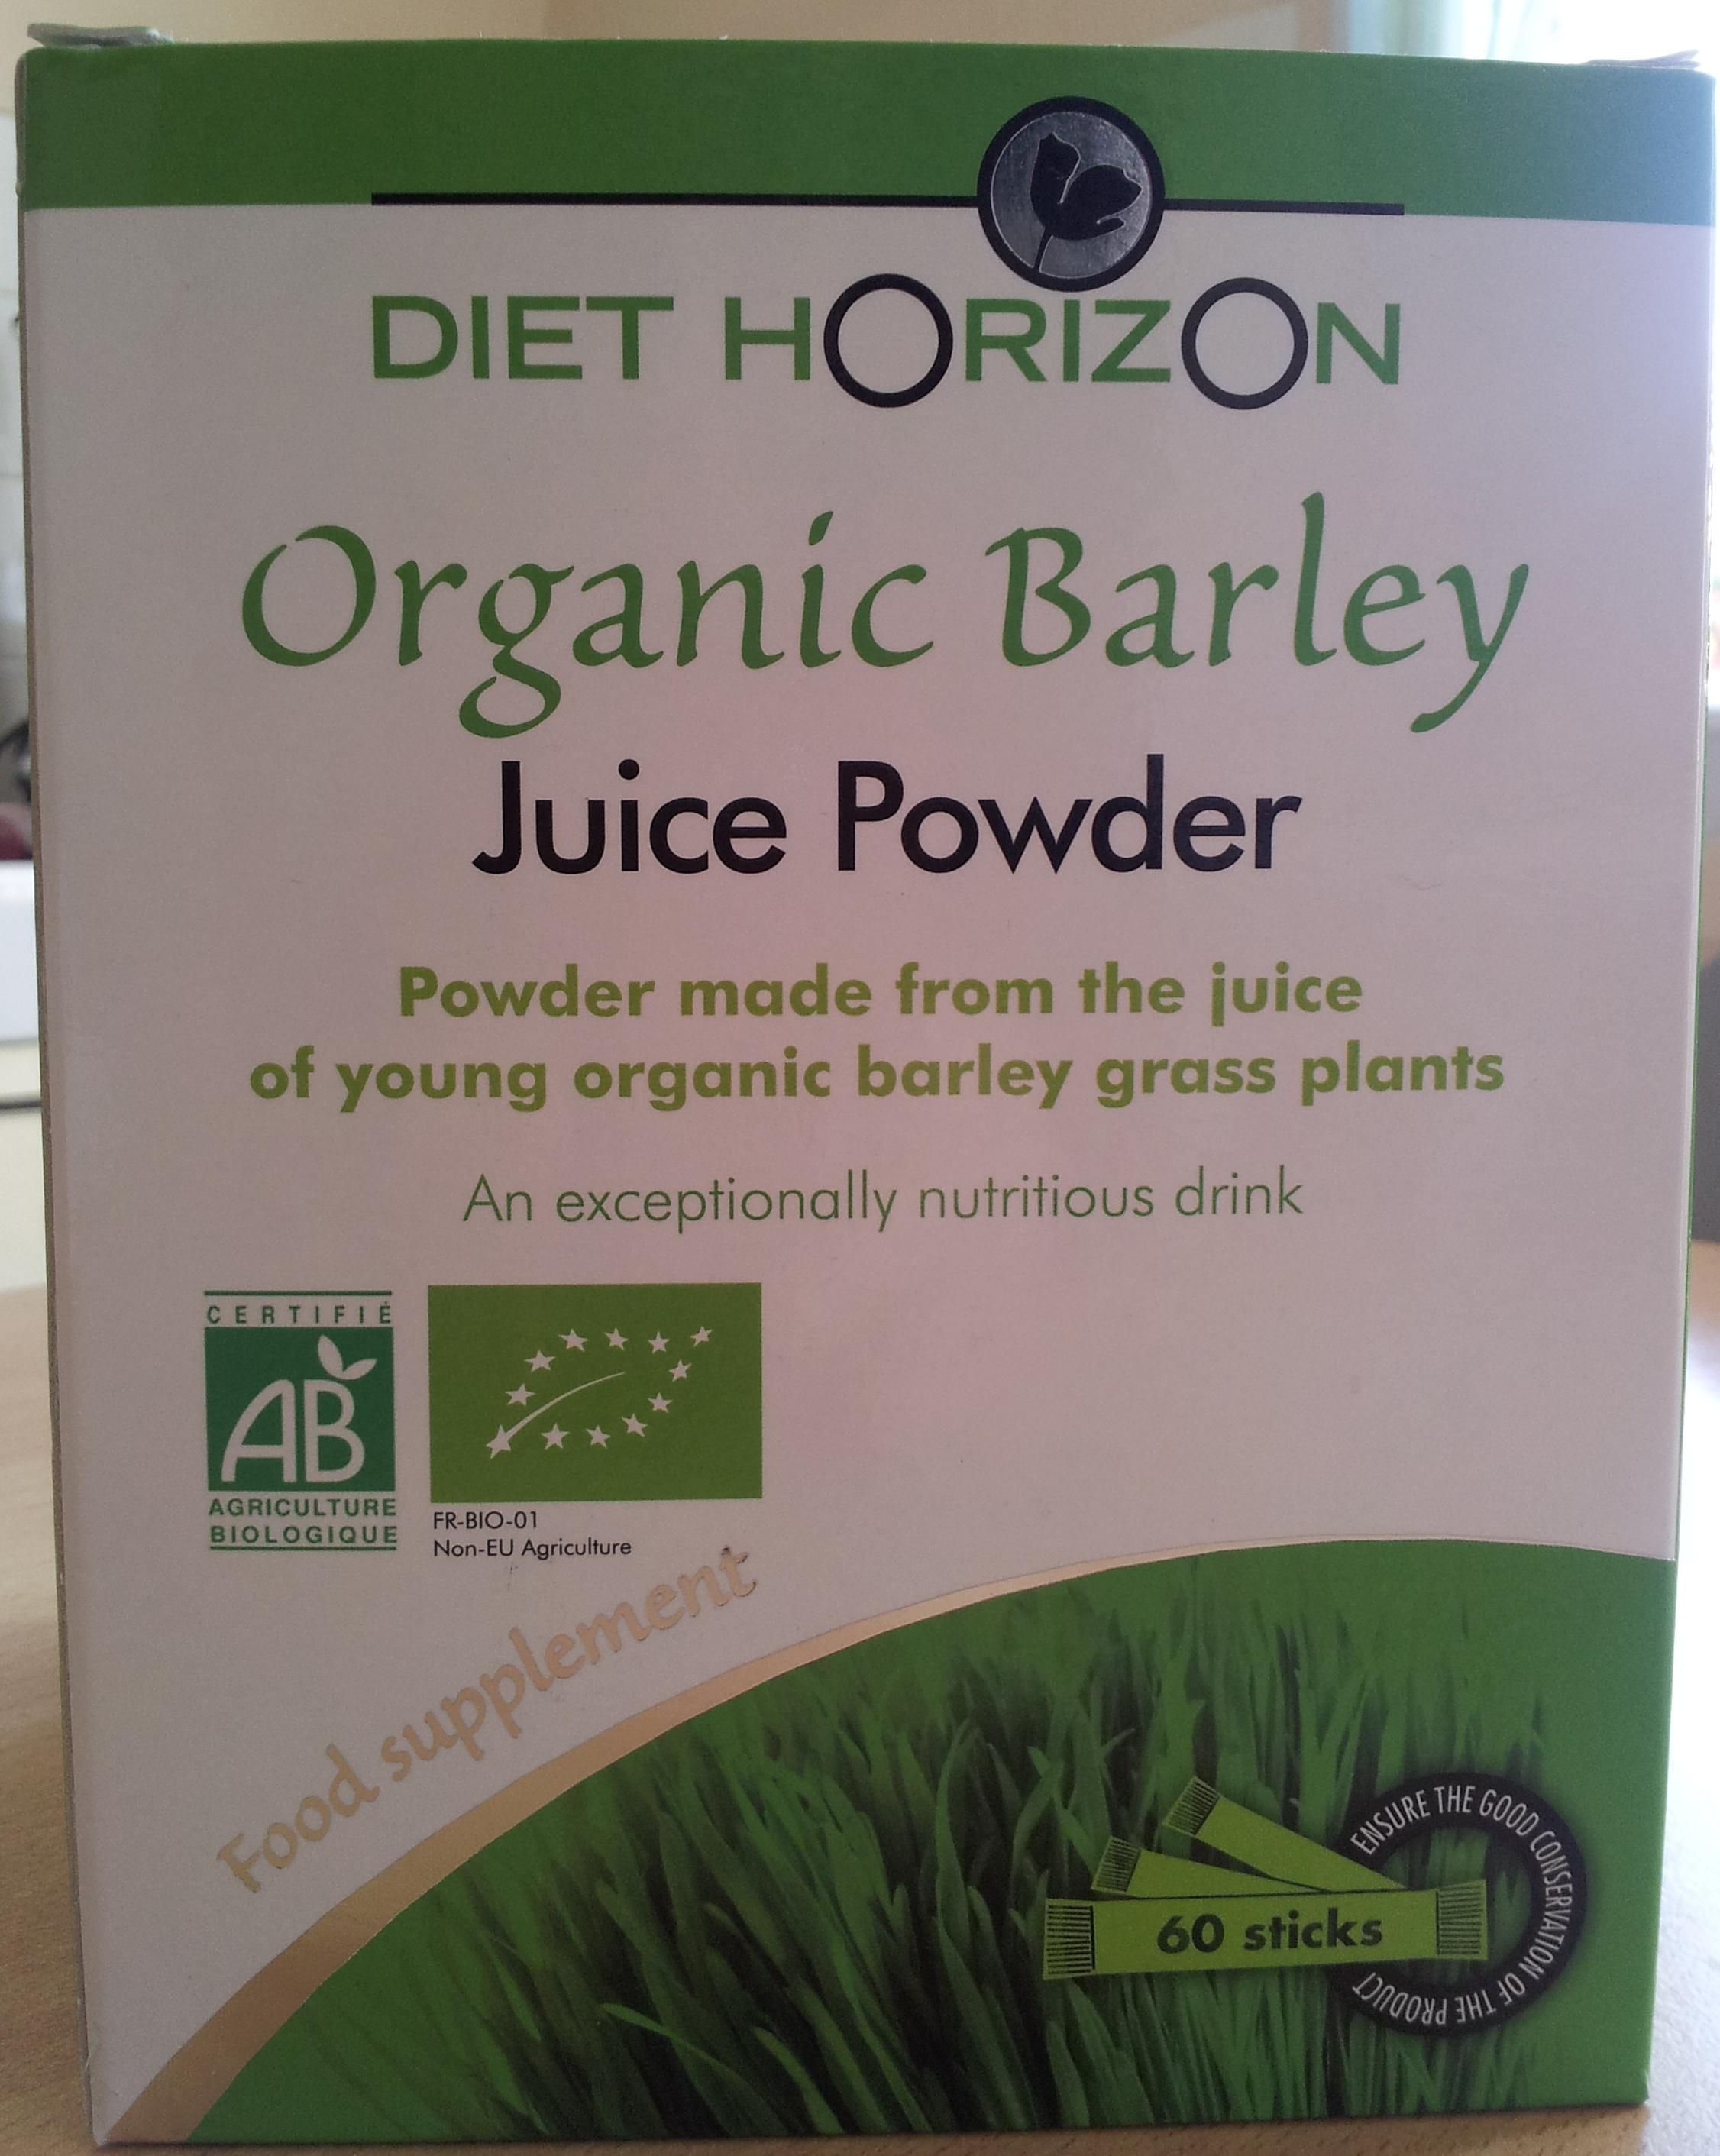 Organic Barley - Juice Powder - Product